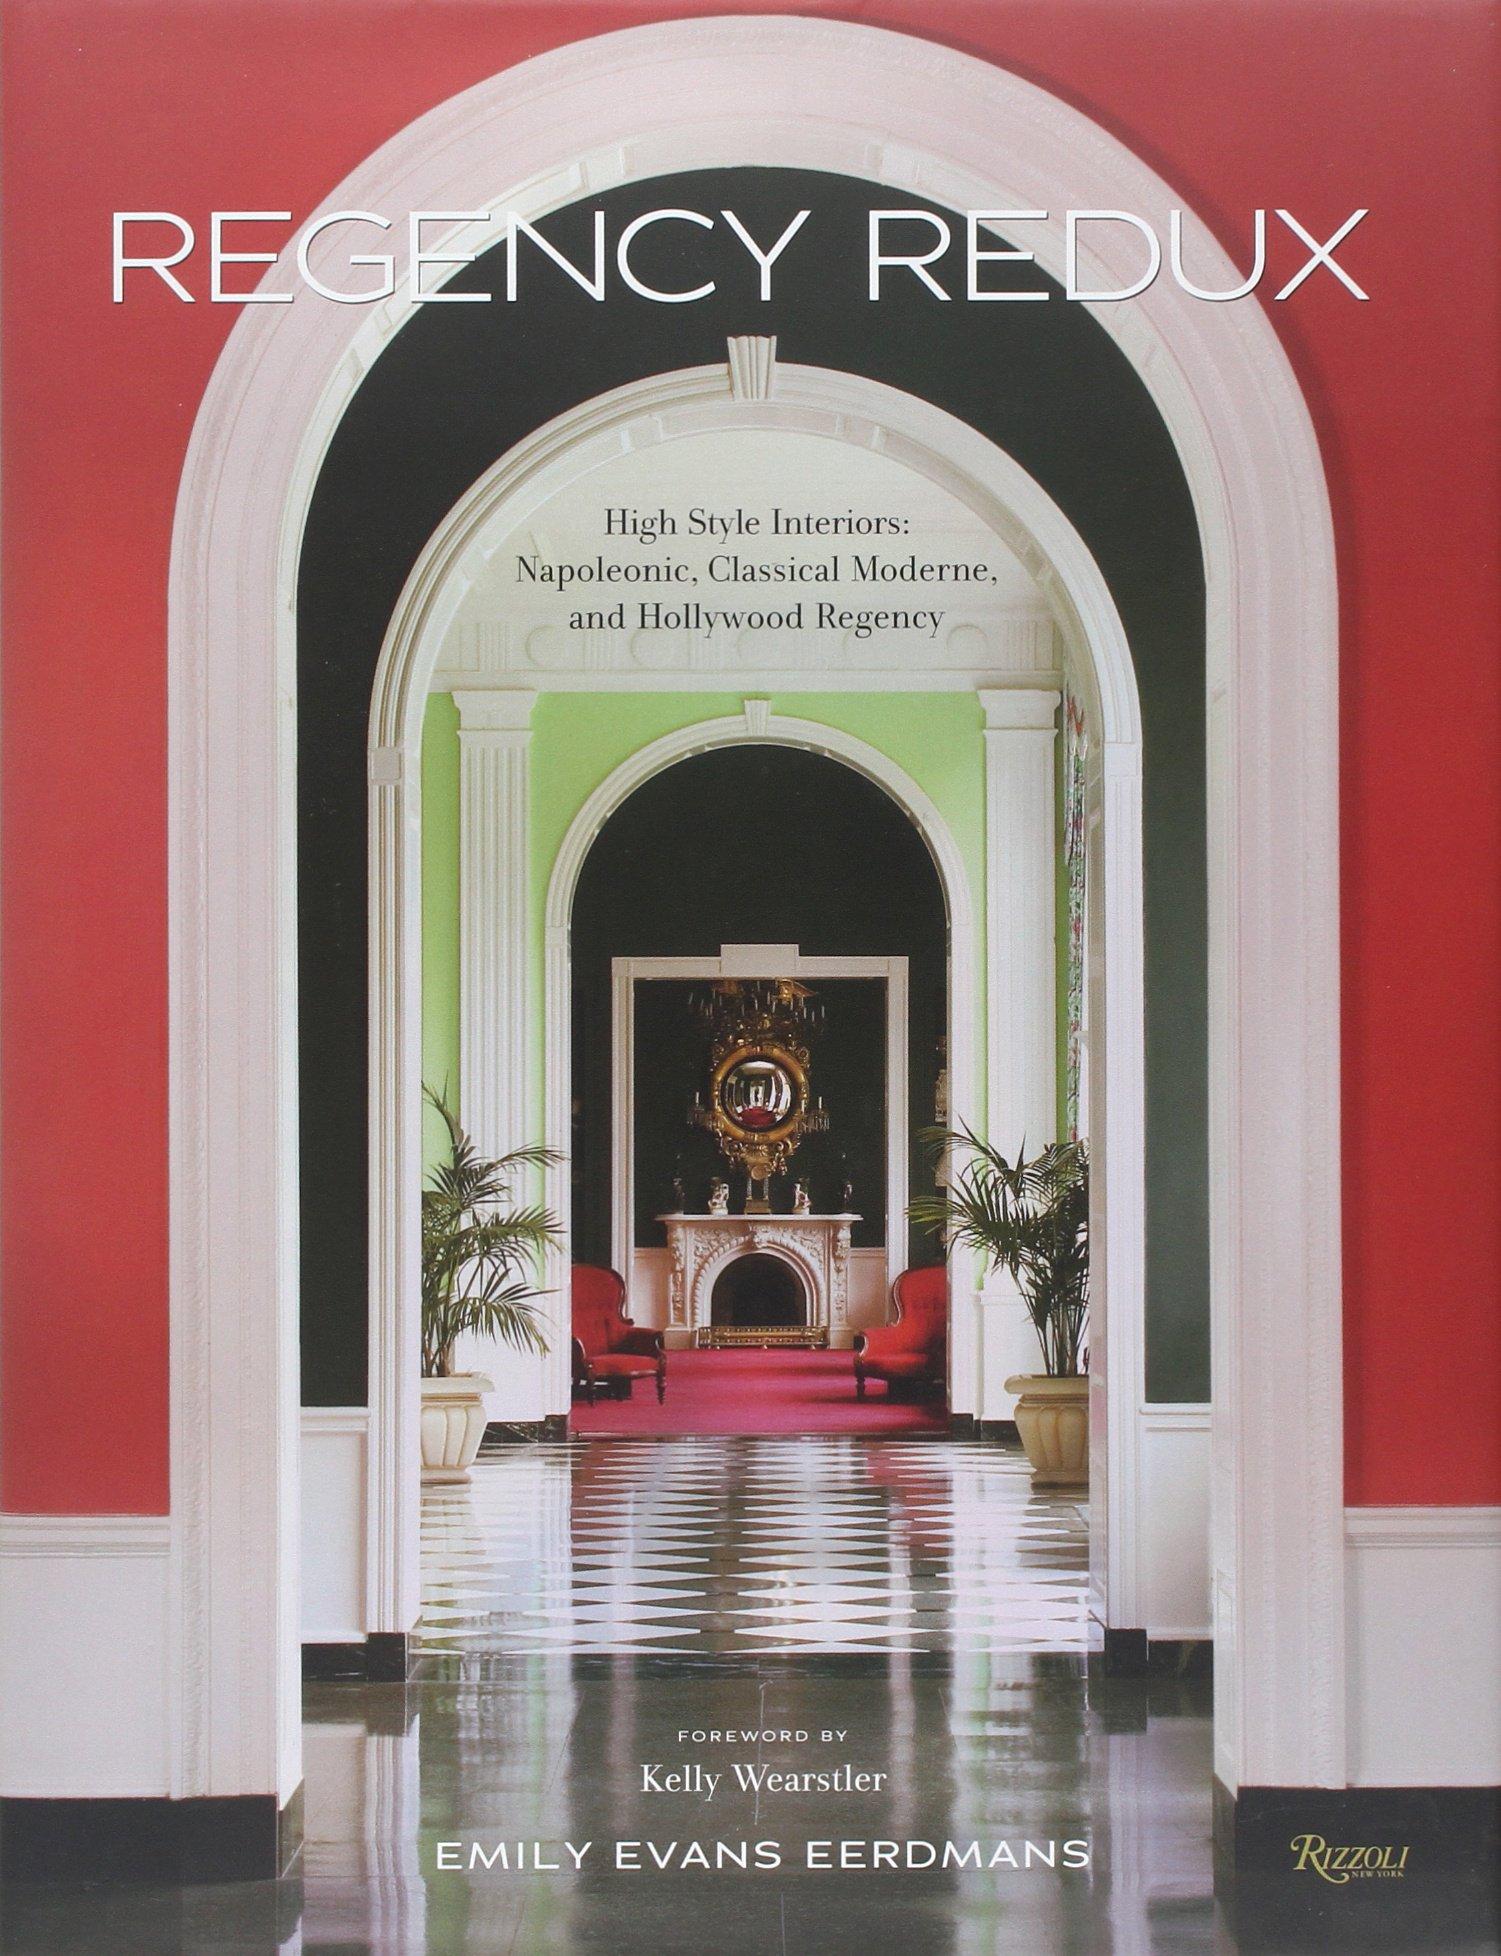 Regency Redux High Style Interiors Napoleonic Classical Moderne And Hollywood Emily Evans Eerdmans Kelly Wearstler 9780847831449 Amazon